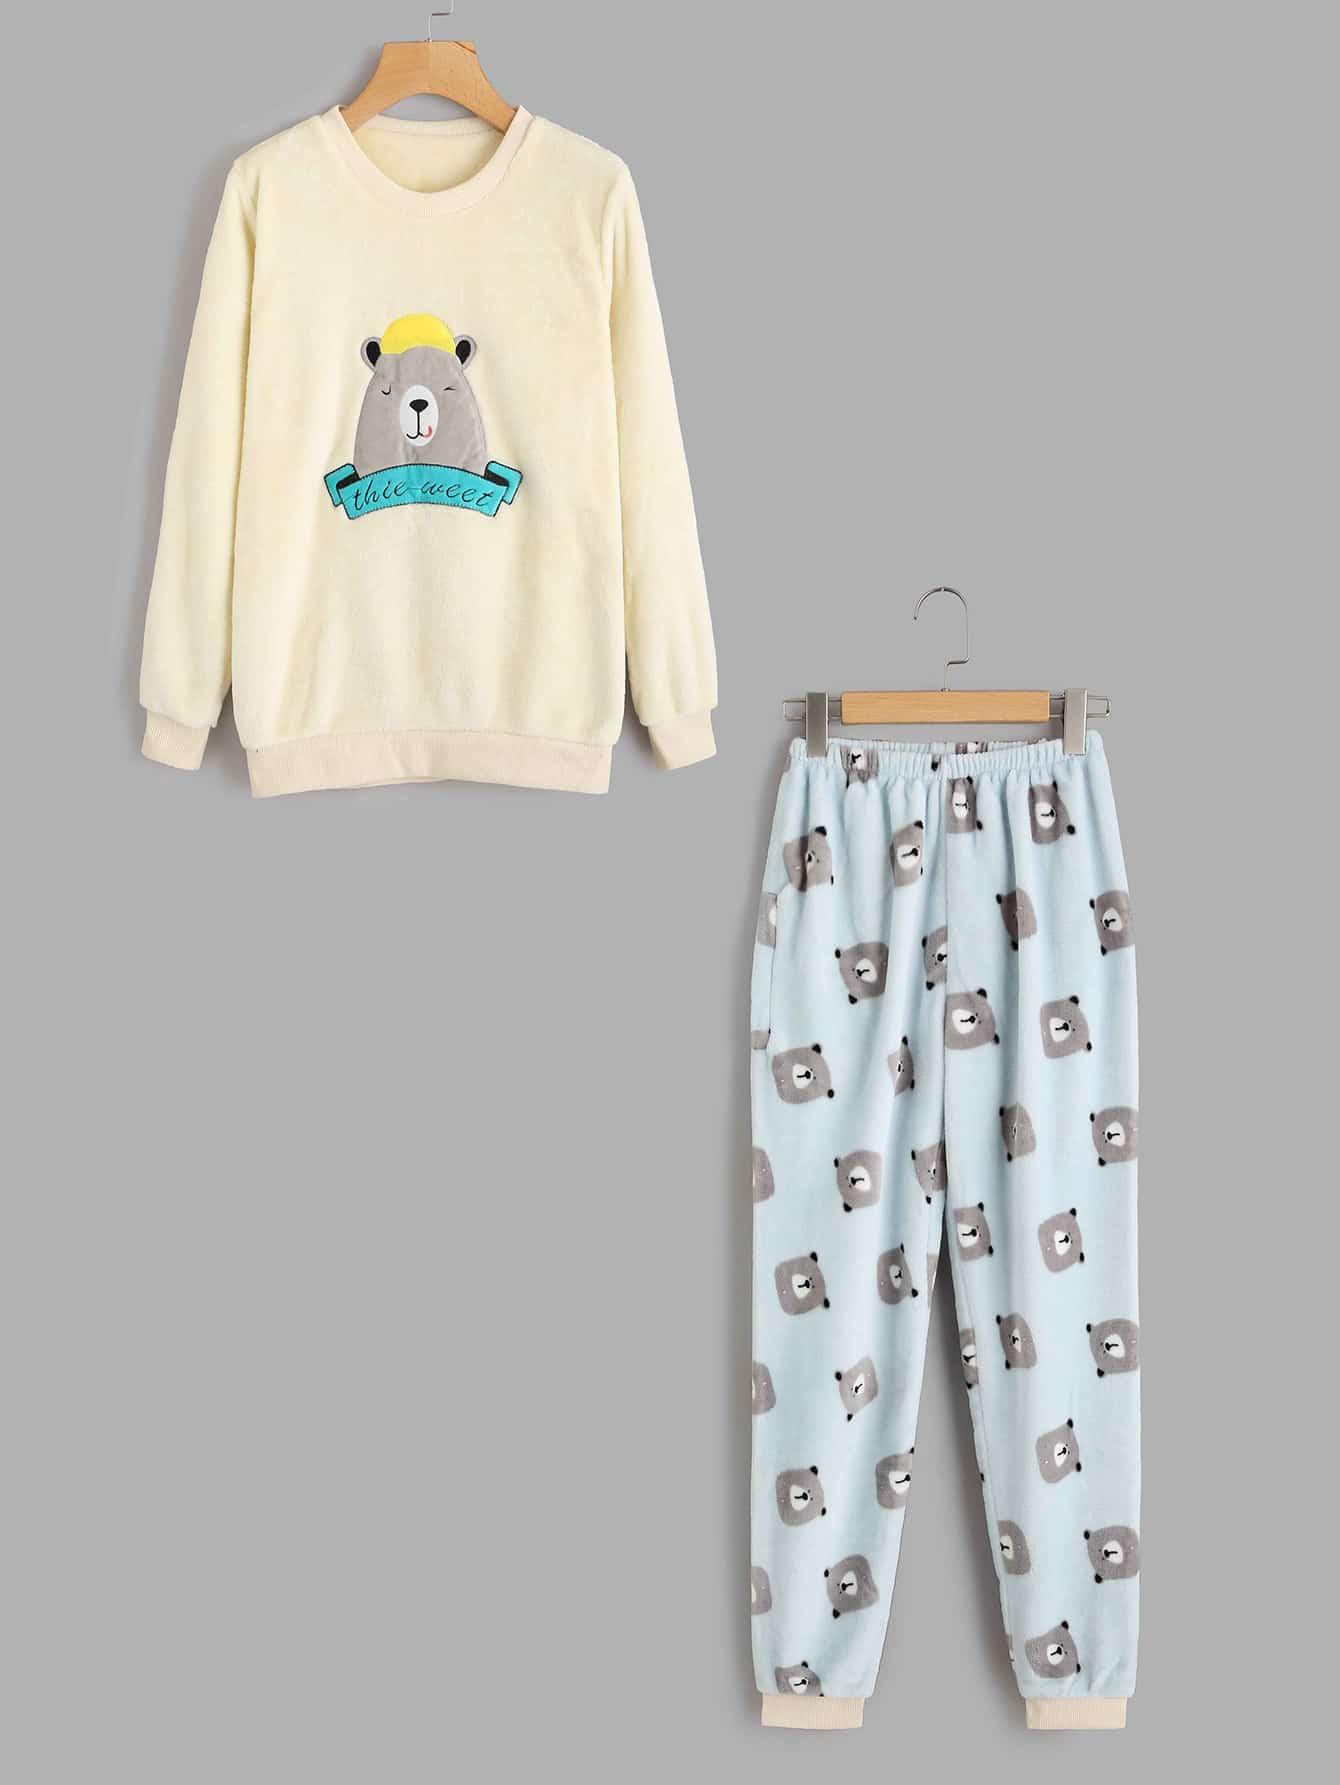 Bear Print Top And Pants Pajama Set flamingo and jungle leaf print top and pants pajama set